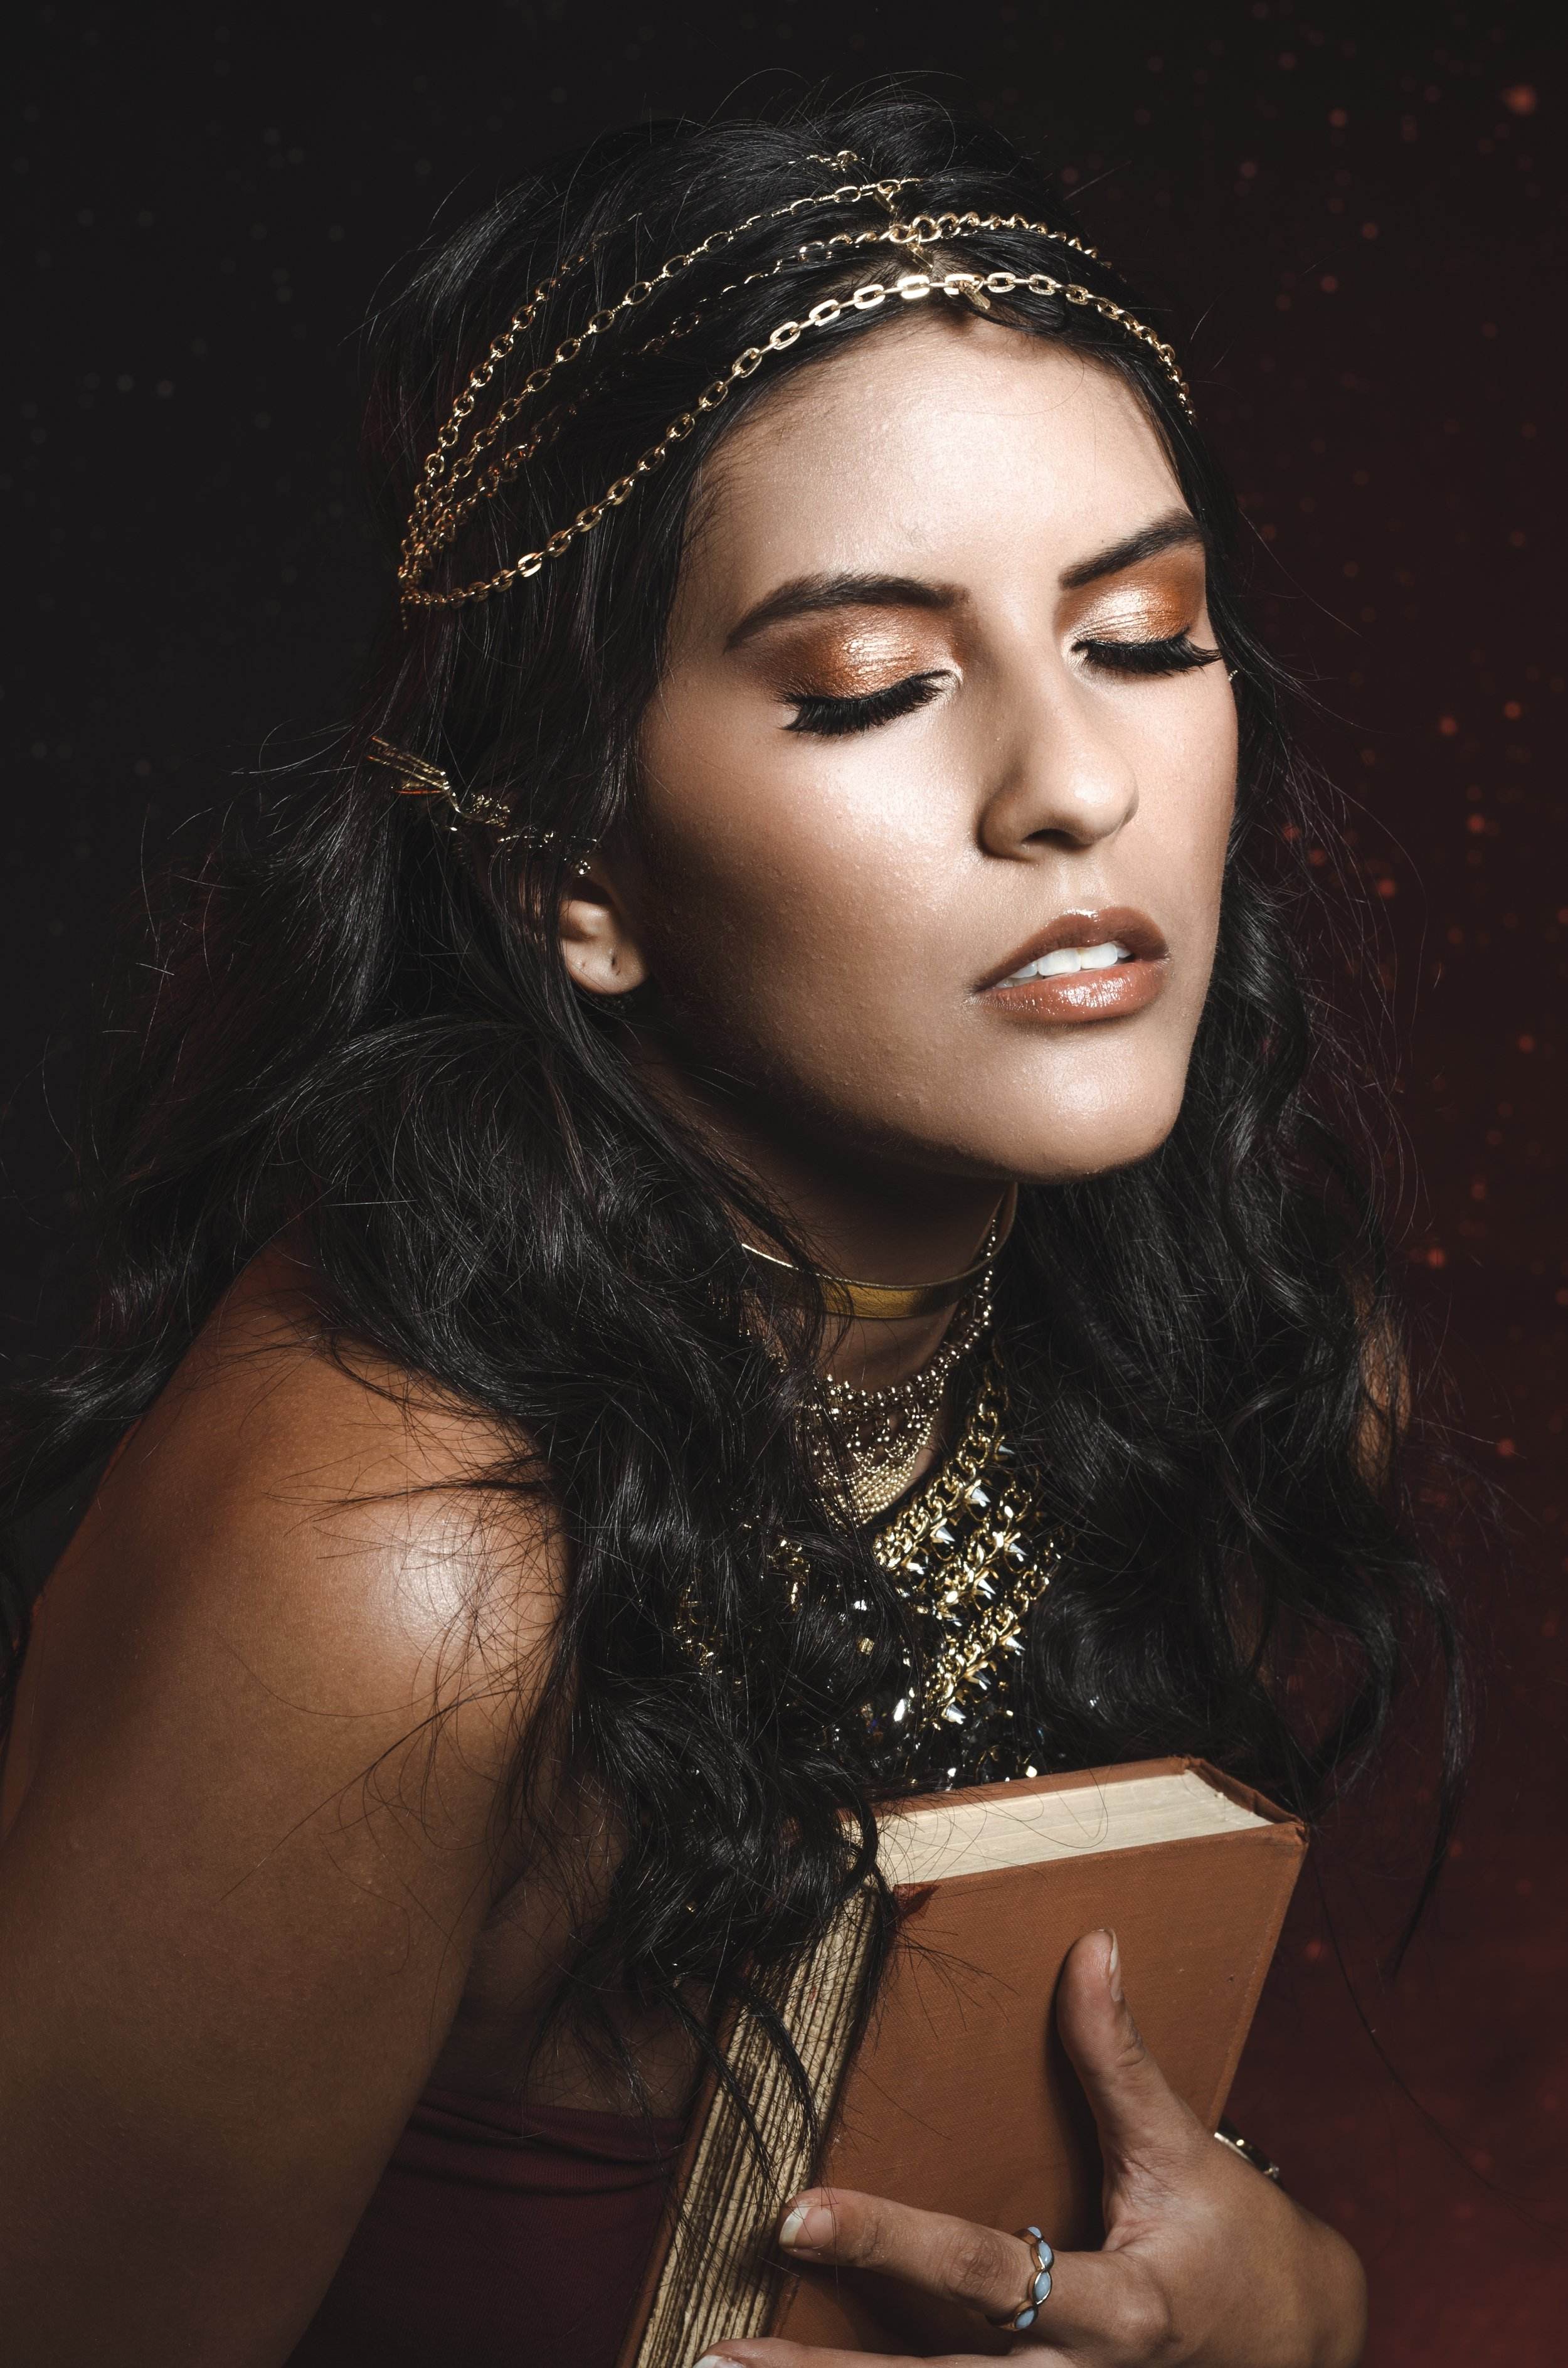 Photographer: Regina Wamba  HMUA: Laura DuVall Makeup Artistry  Model: Shilow Sullyboo